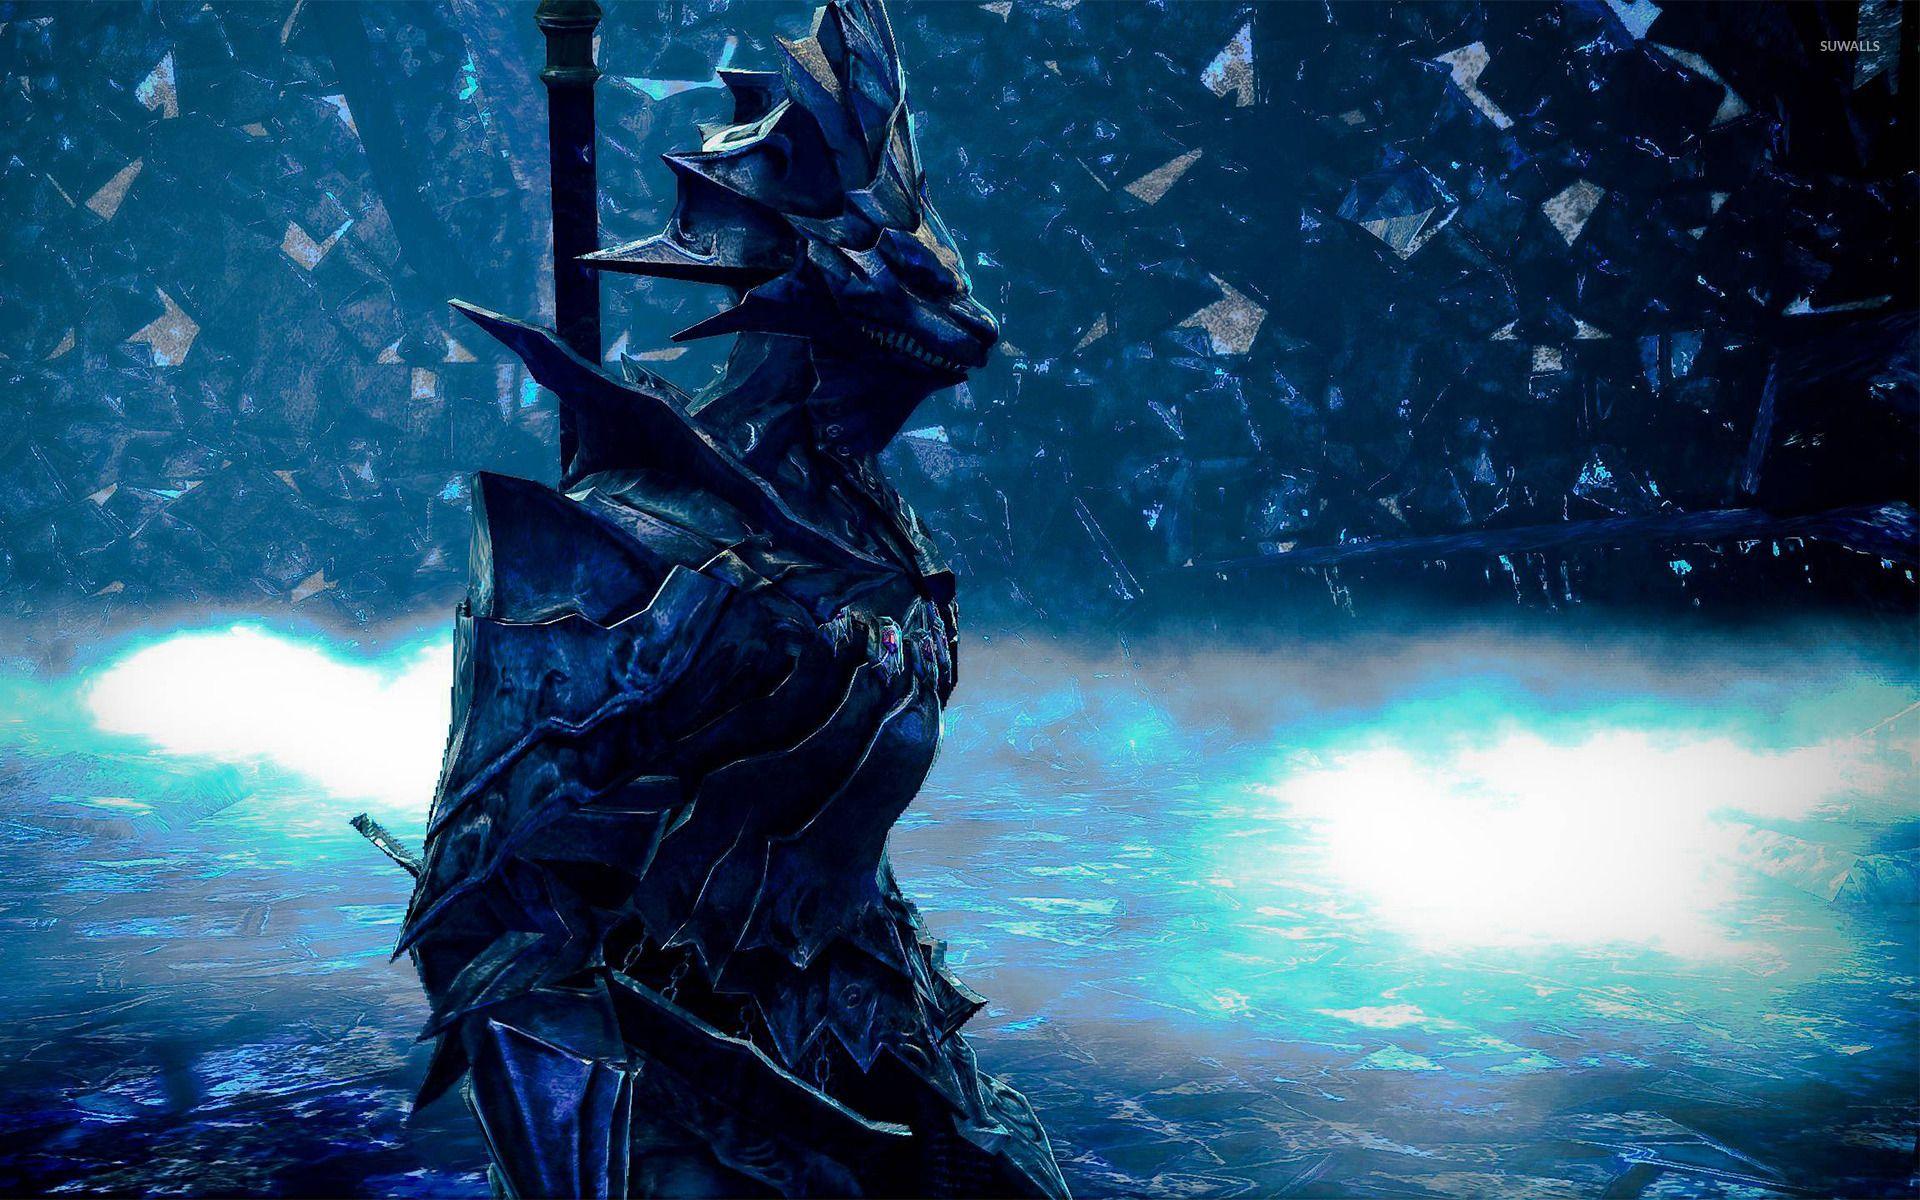 Dark Souls 3 Ps4 Wallpaper | Dark souls, Dark souls 3 ...